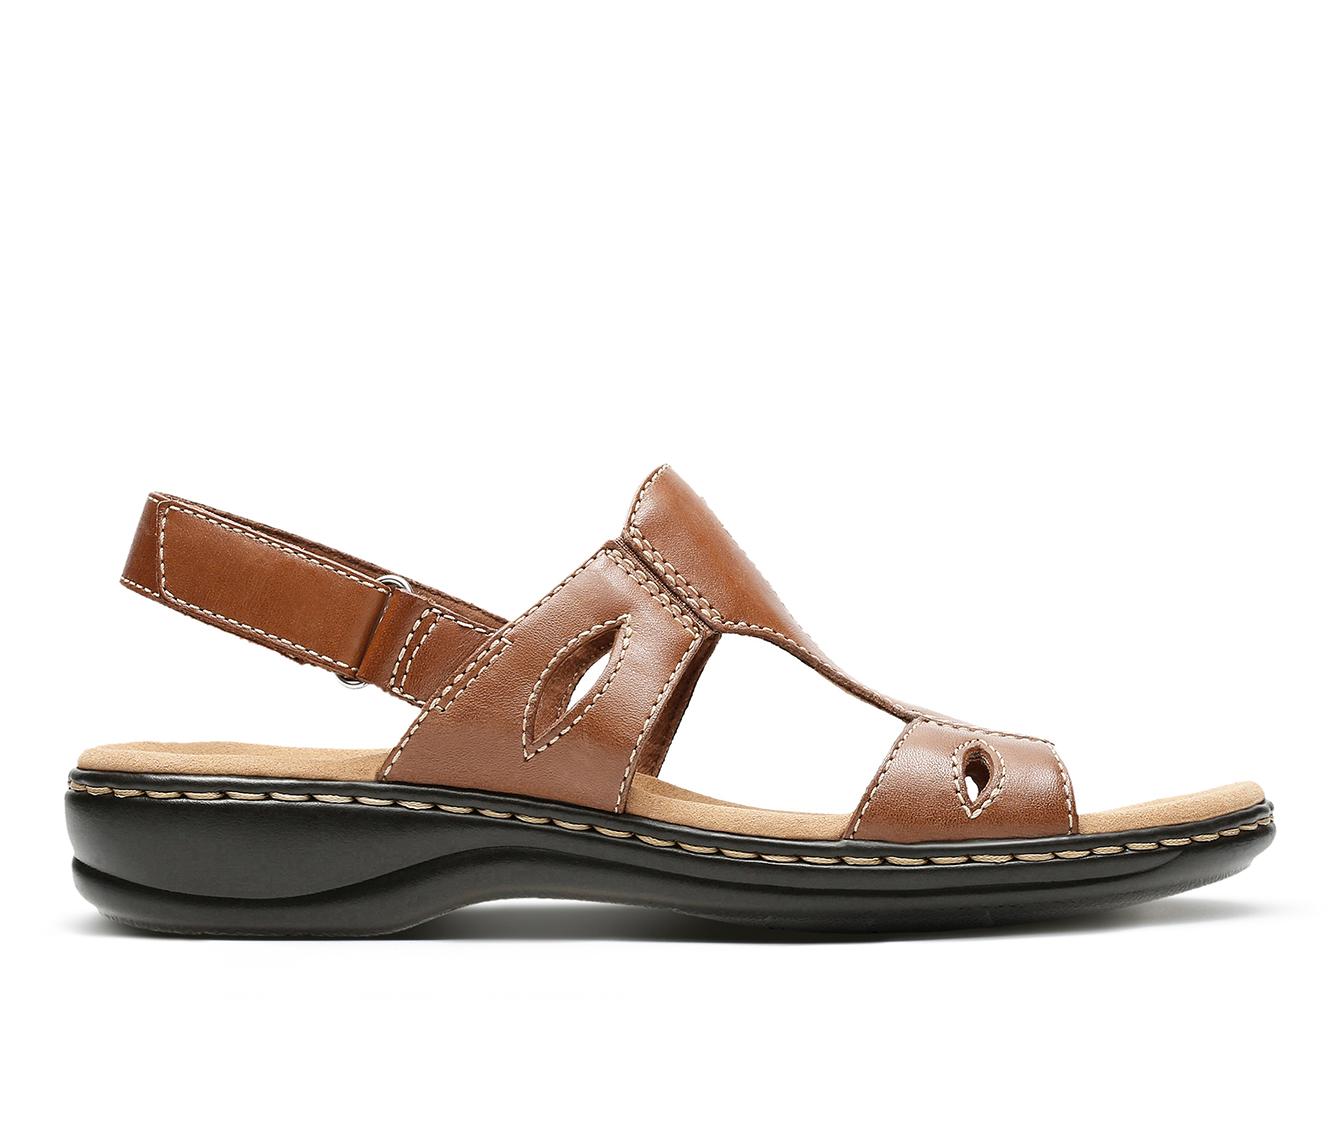 Clarks Leisa Lakelyn Women's Sandal (Brown Leather)